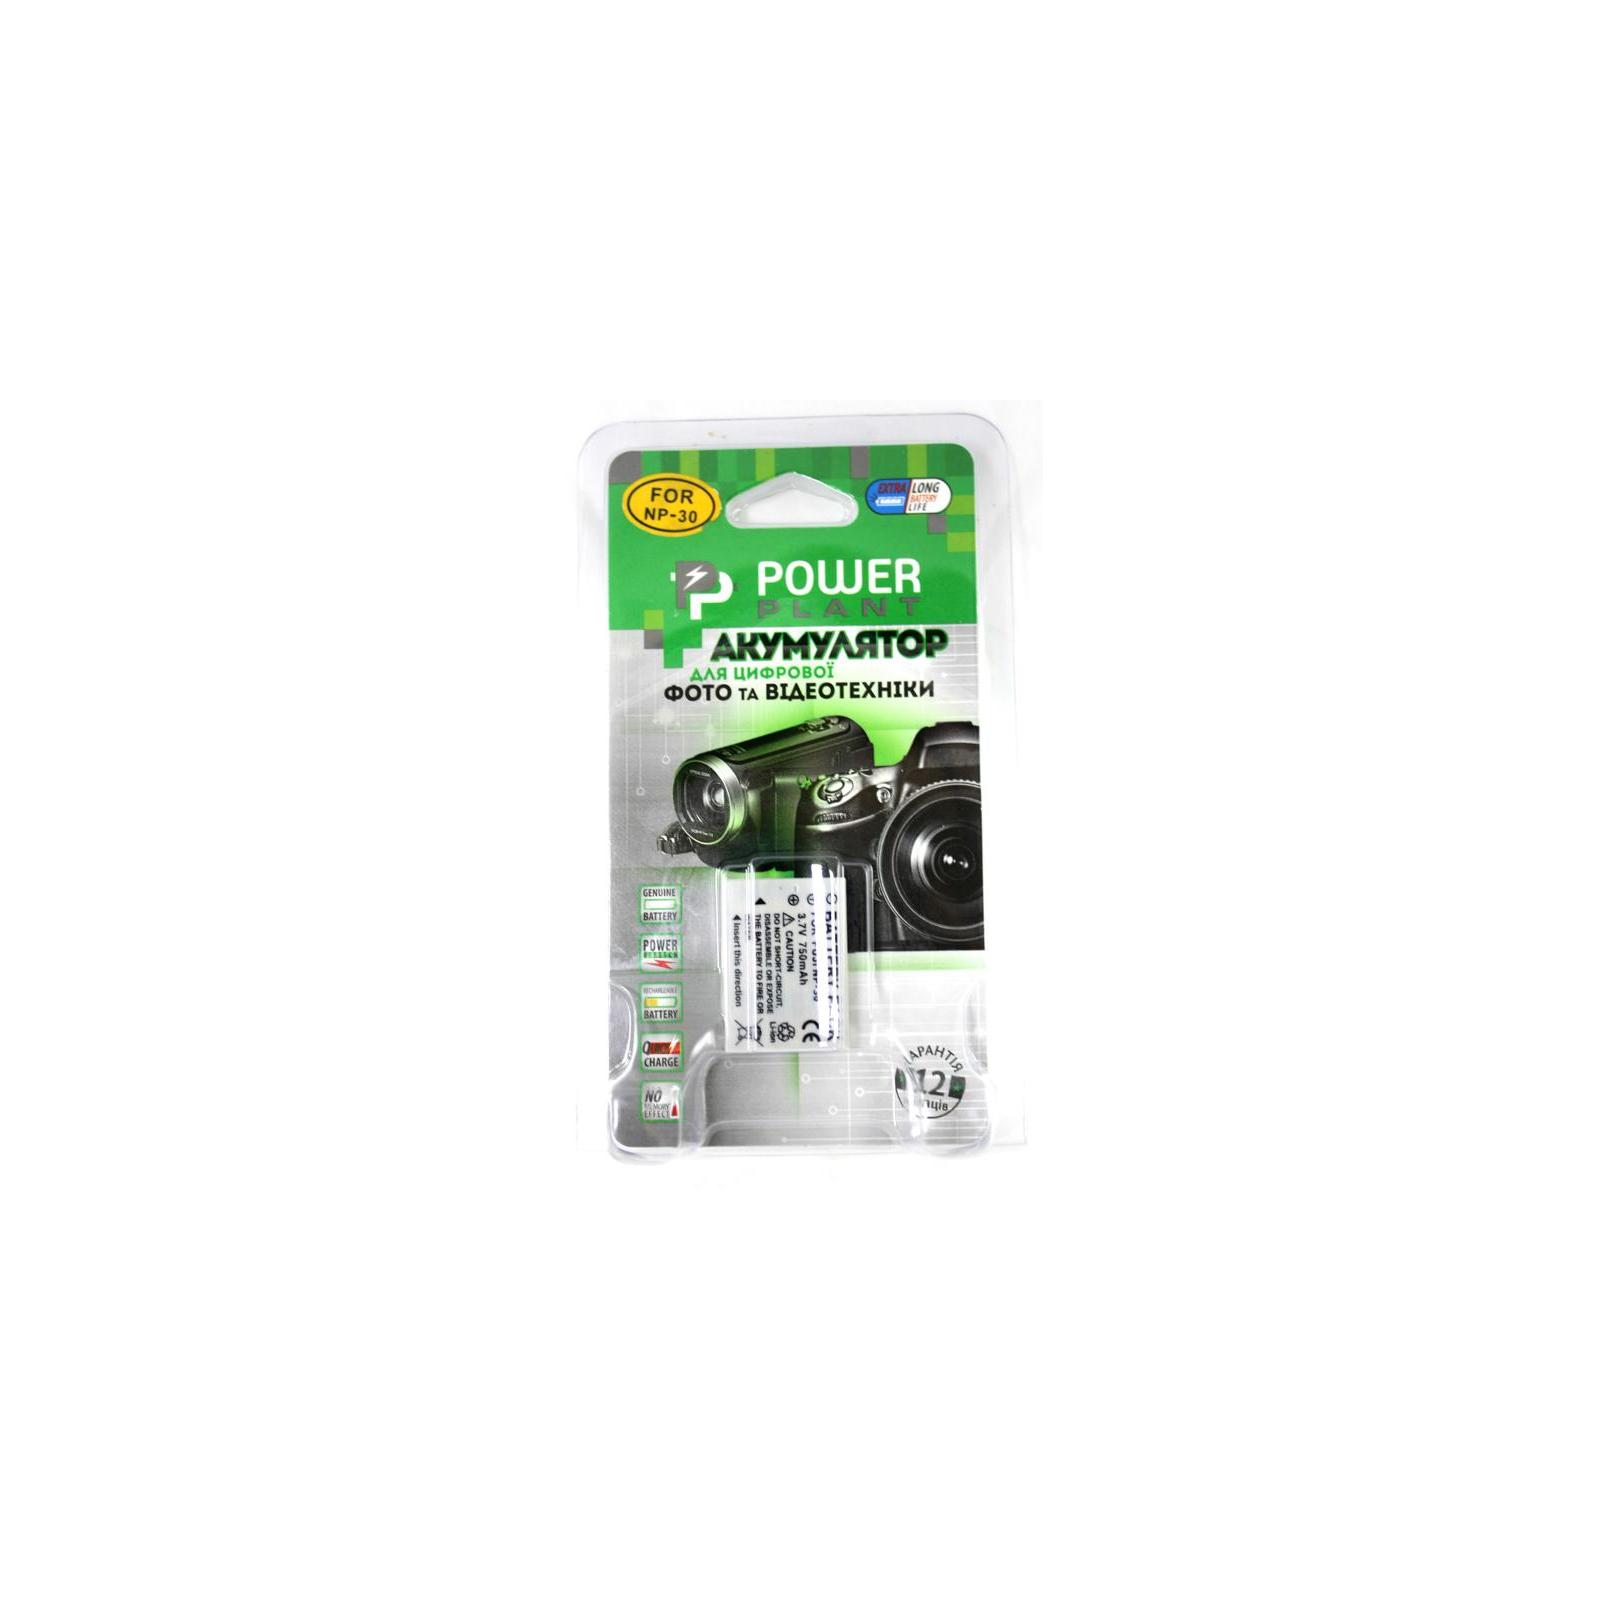 Аккумулятор к фото/видео PowerPlant Fuji NP-30 (DV00DV1045) изображение 3